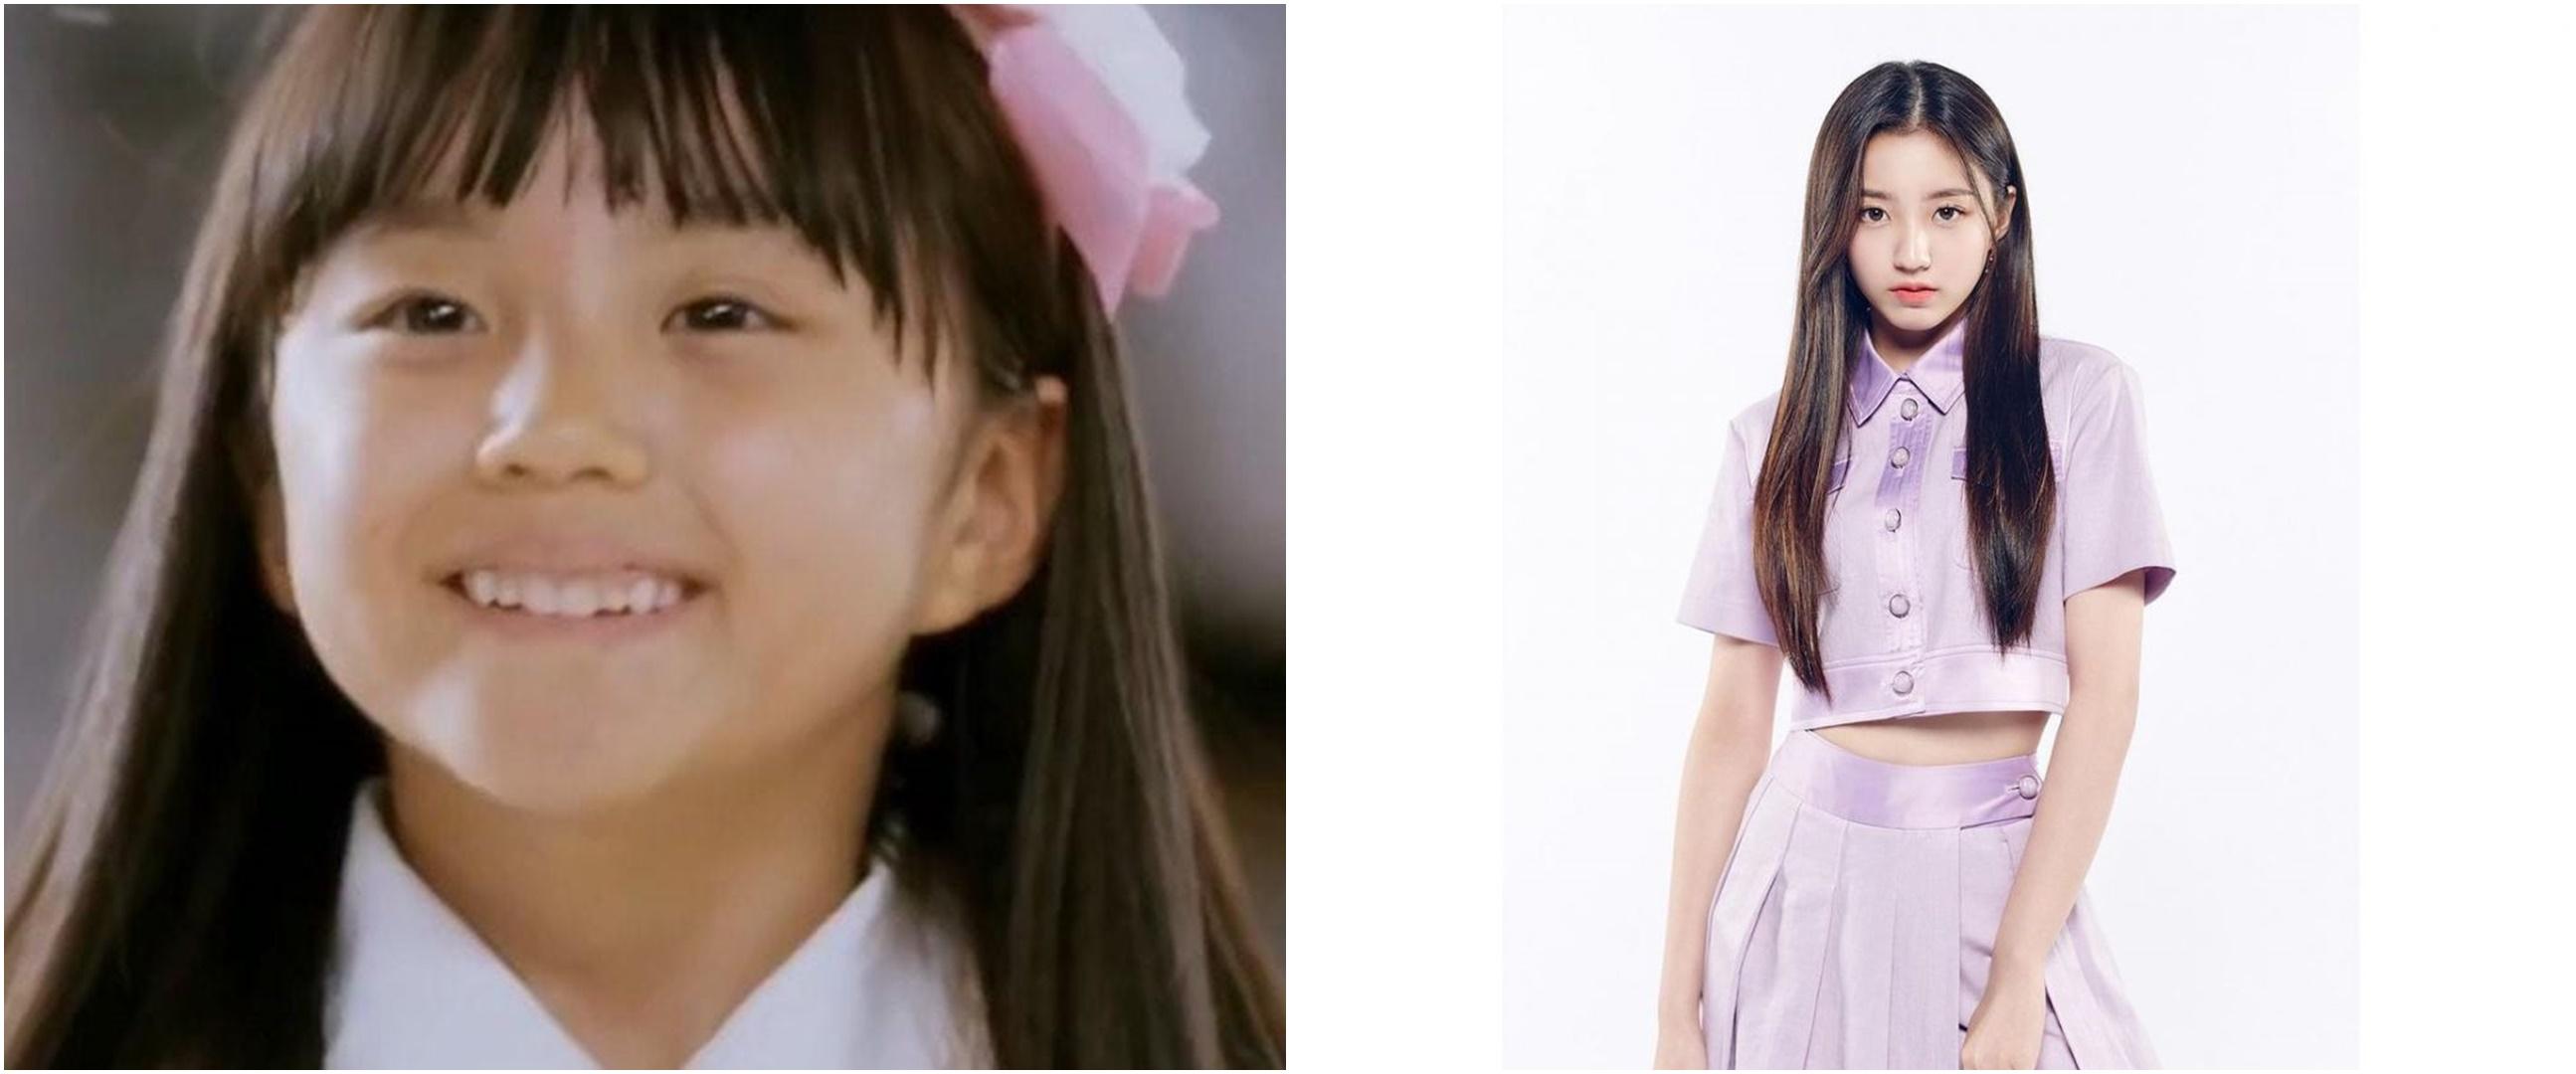 Ingat anak Sailor Moon 'Miracle in Cell No 7'? Ini 9 potretnya kini